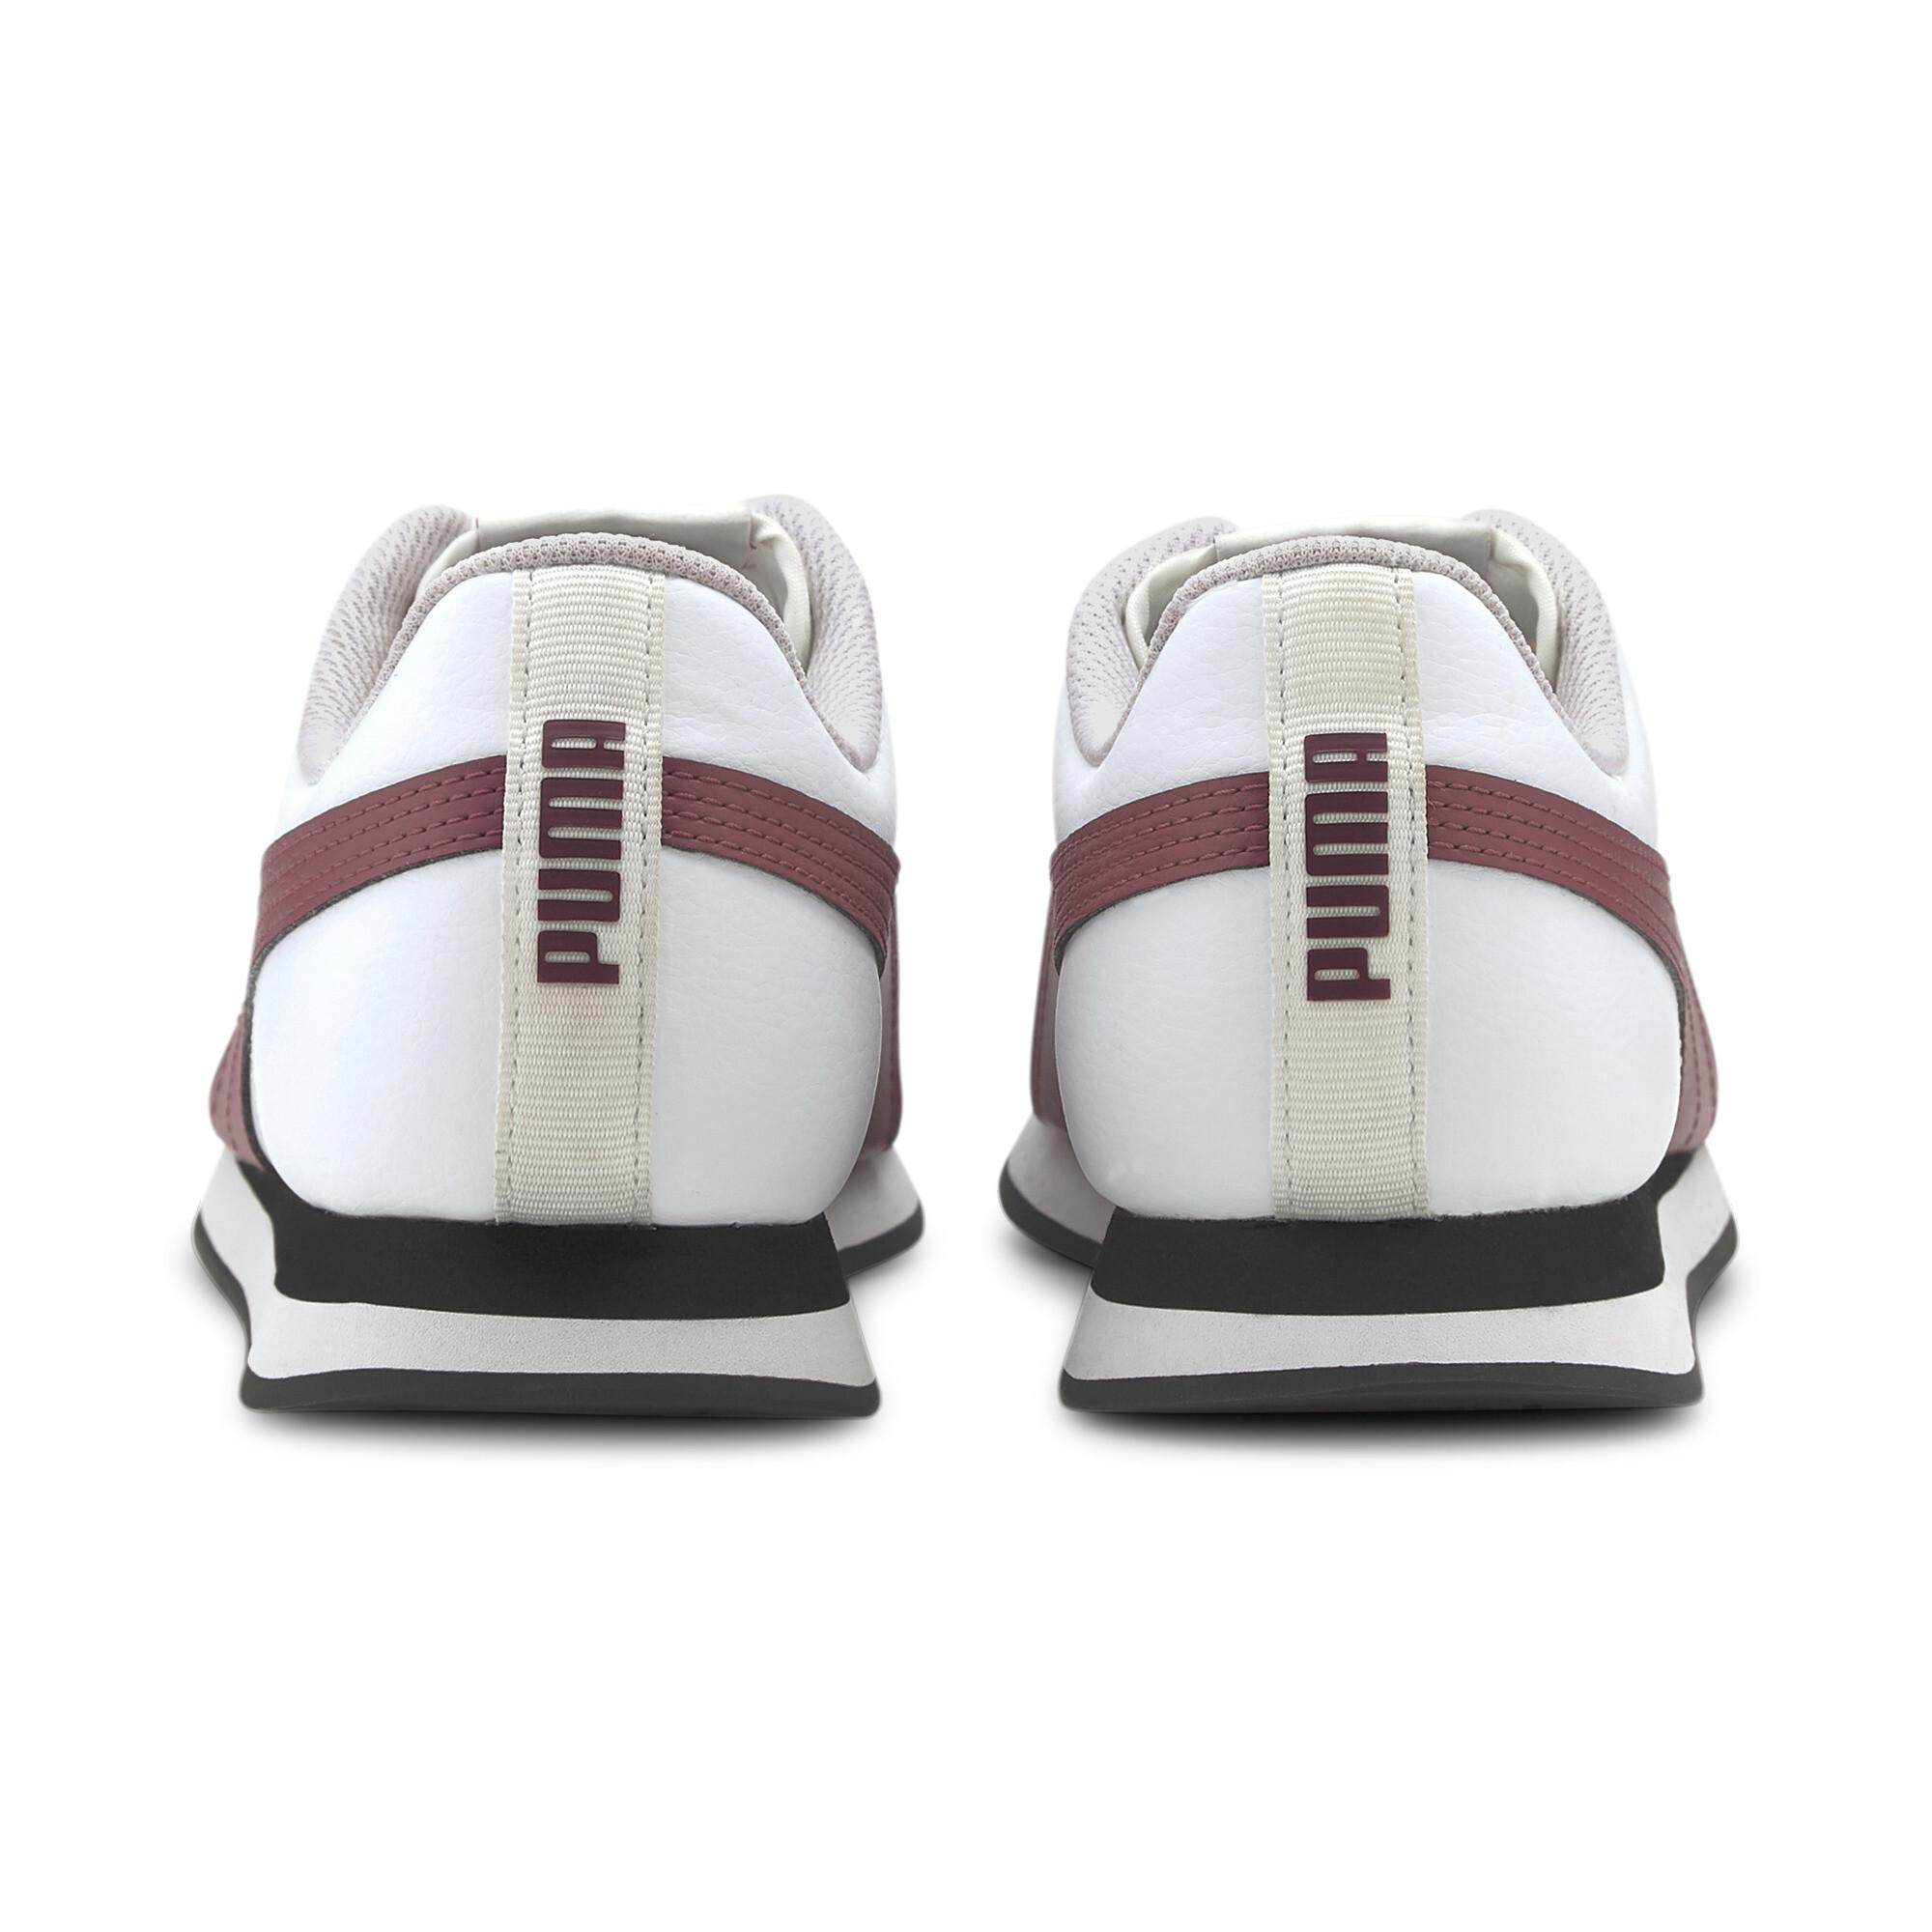 PUMA-Men-039-s-Turin-II-Sneakers thumbnail 26